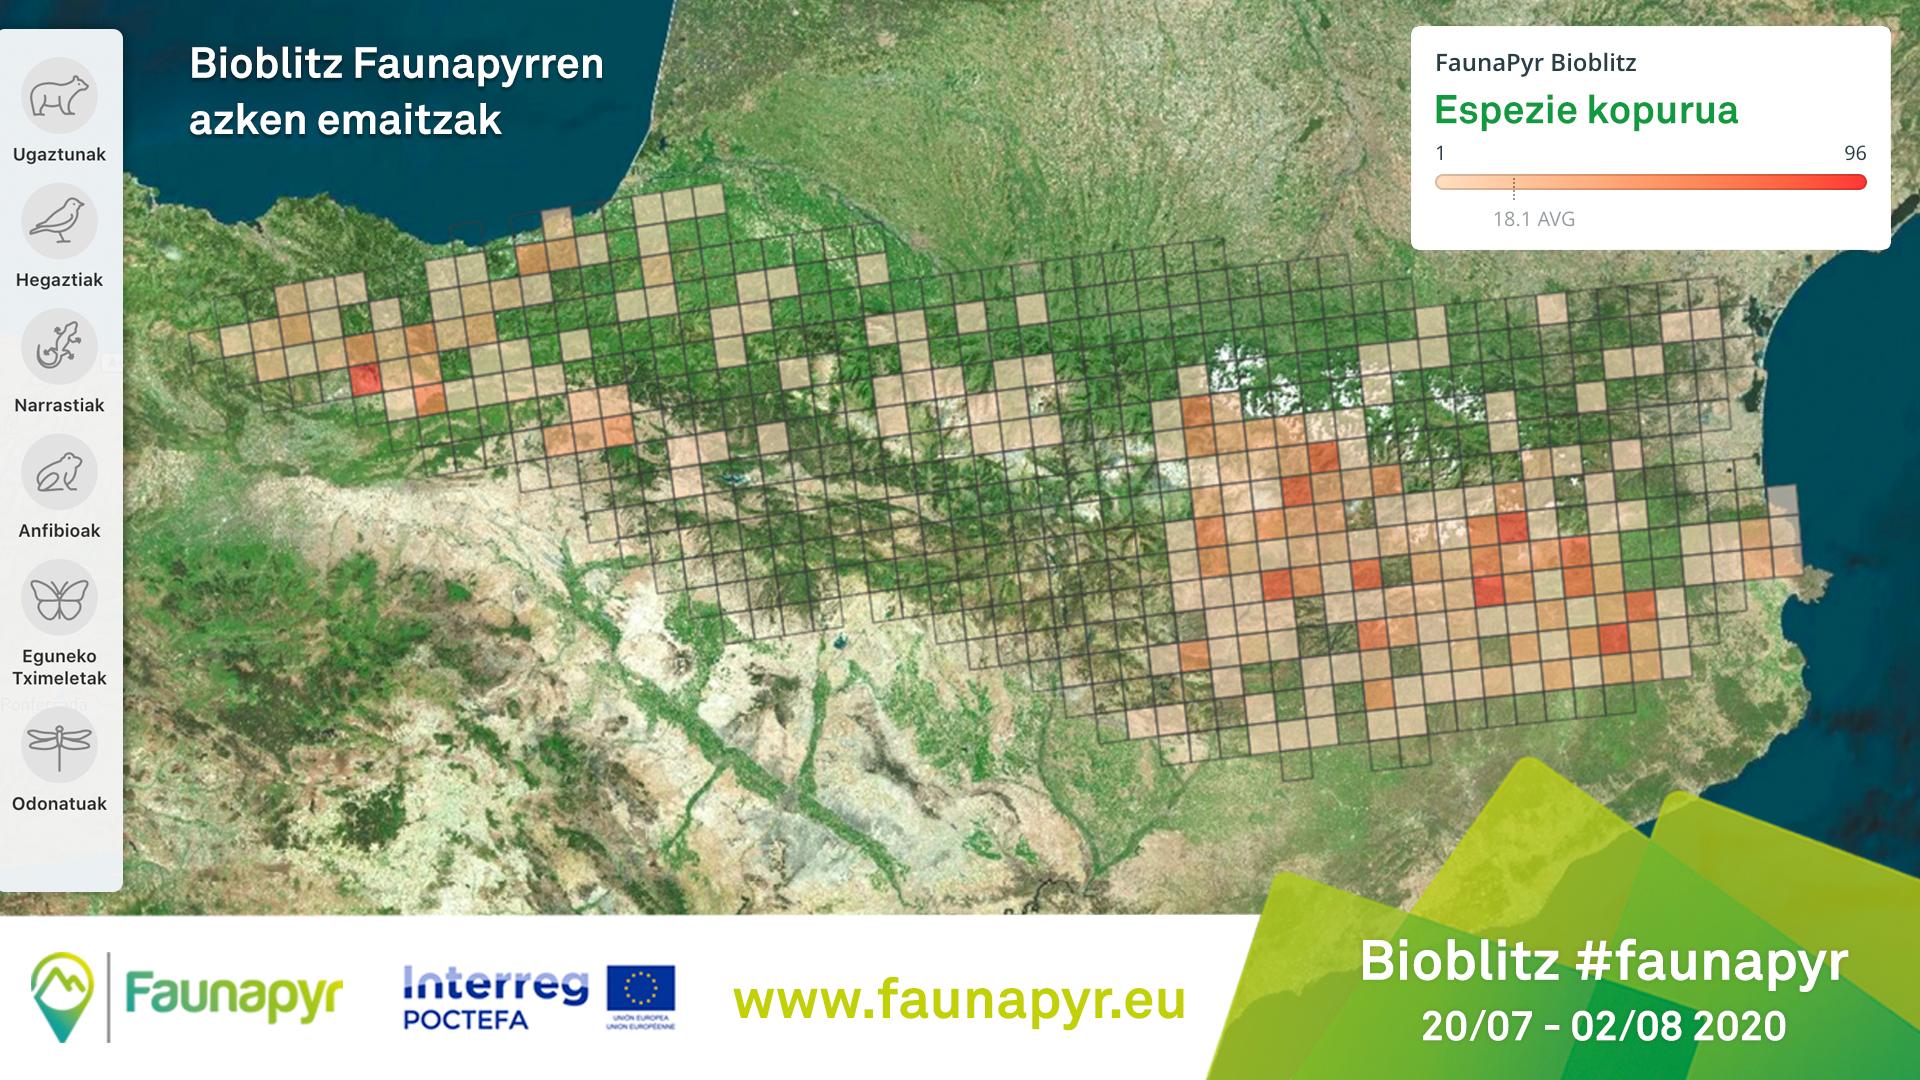 http://files.biolovision.net/www.ornitho.eus/userfiles/EUS-Mapa-especies-Resultats-Bioblitz.jpg